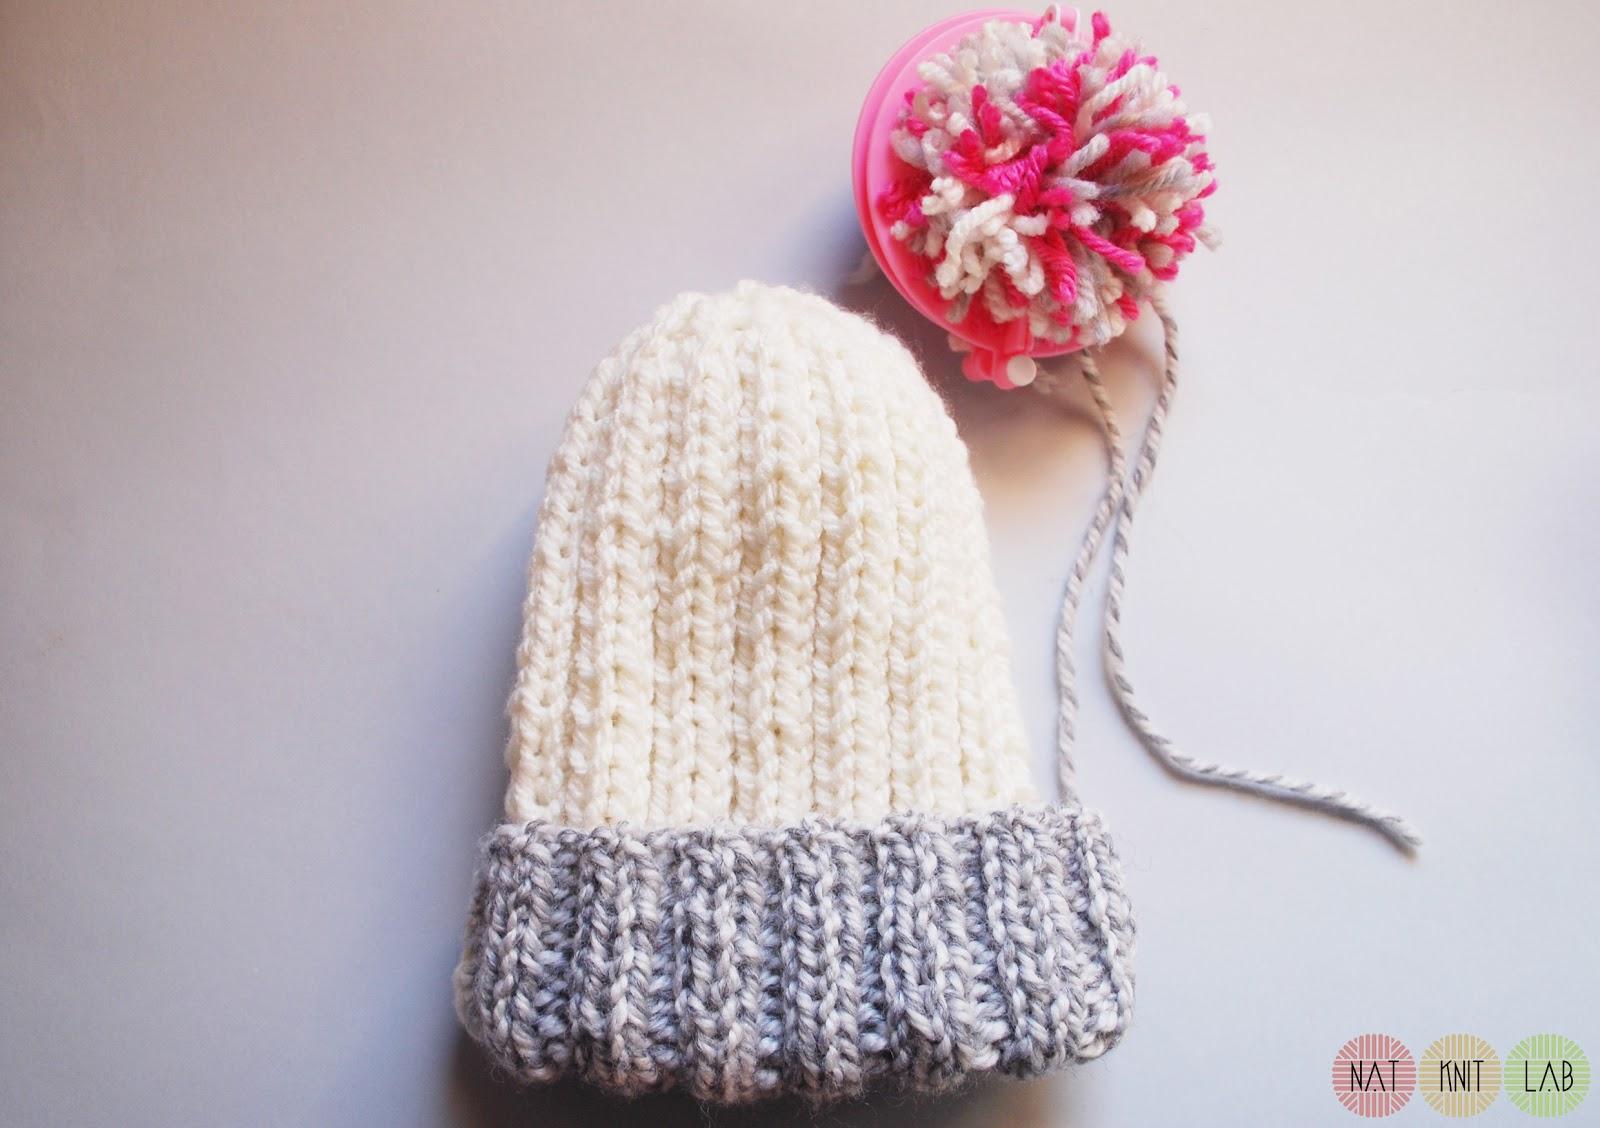 nat knit lab: febrero 2013